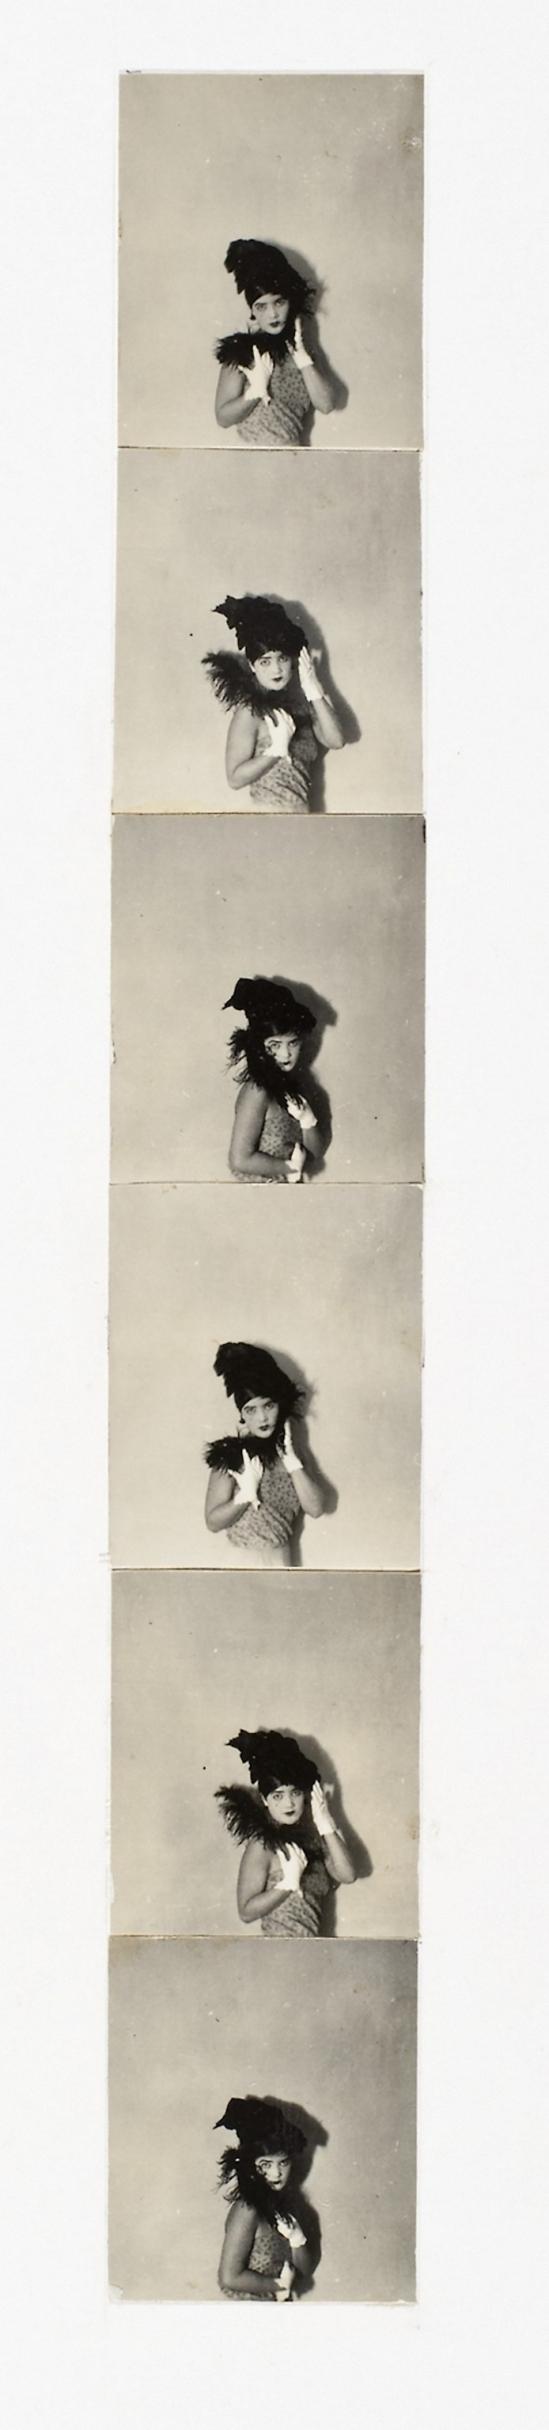 Renata Bracksieck - Self-Portrait, 1920